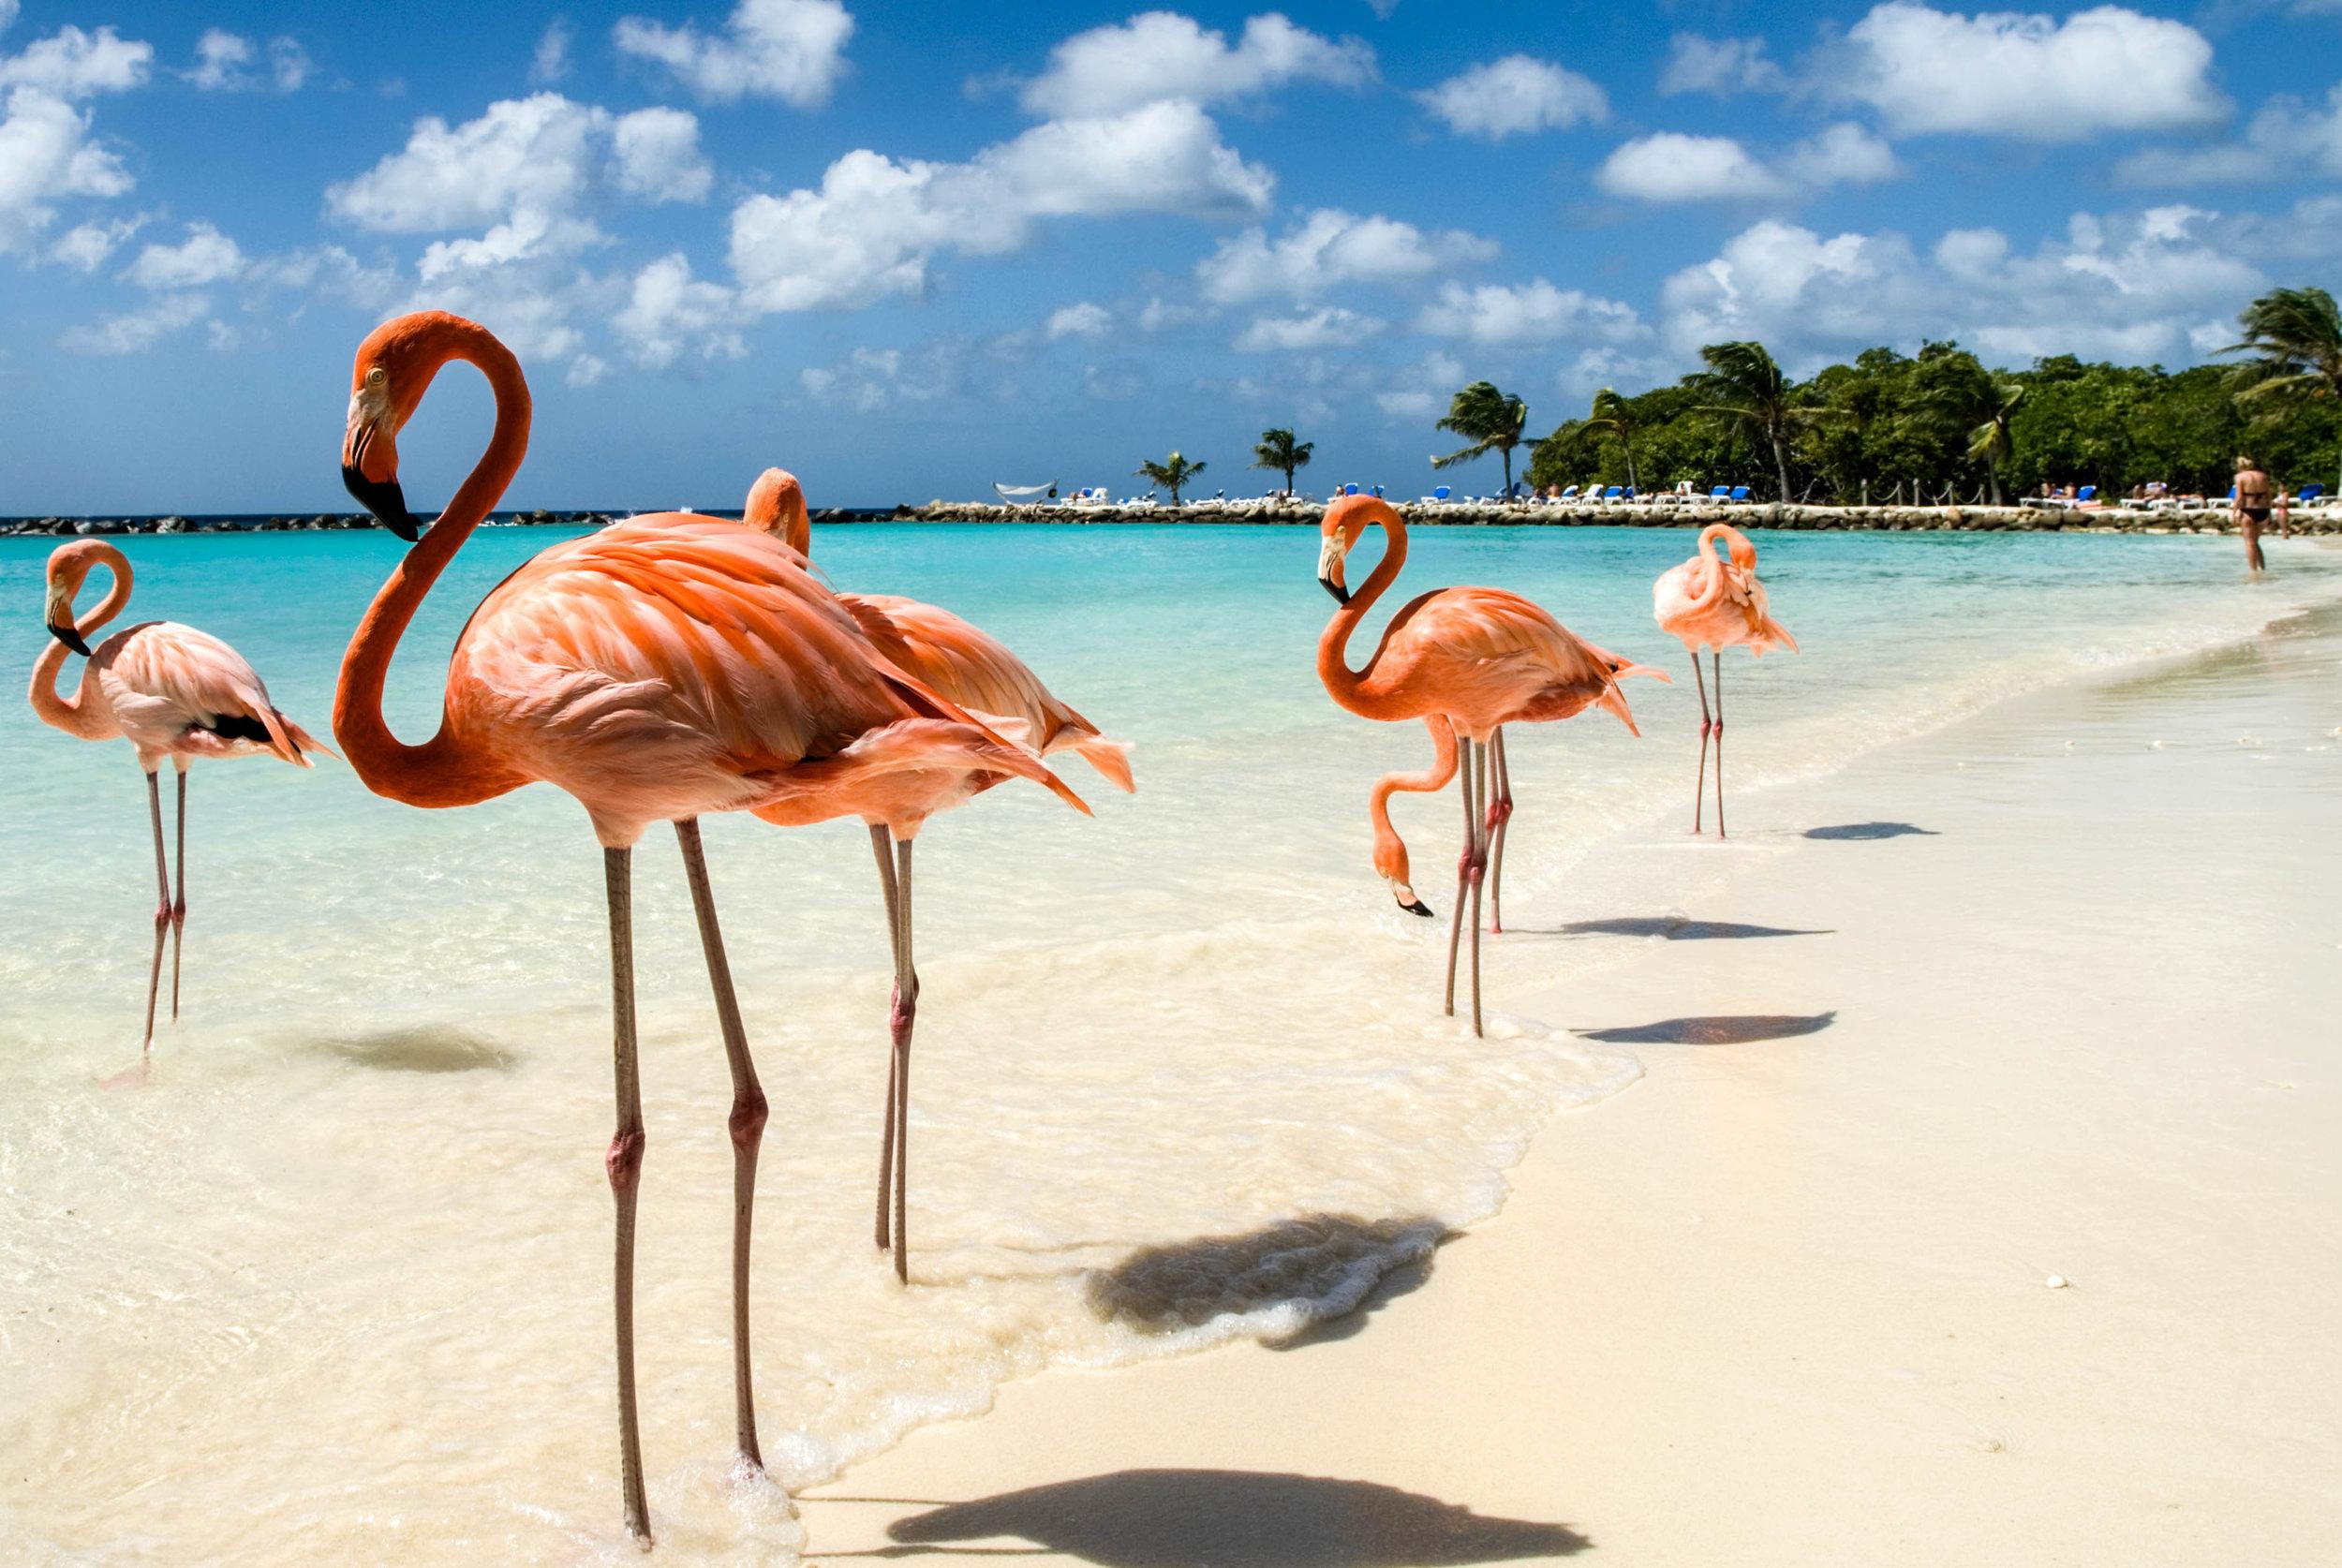 Flamingos-on-the-Beach-iStock_8252068_LARGE-2.jpg